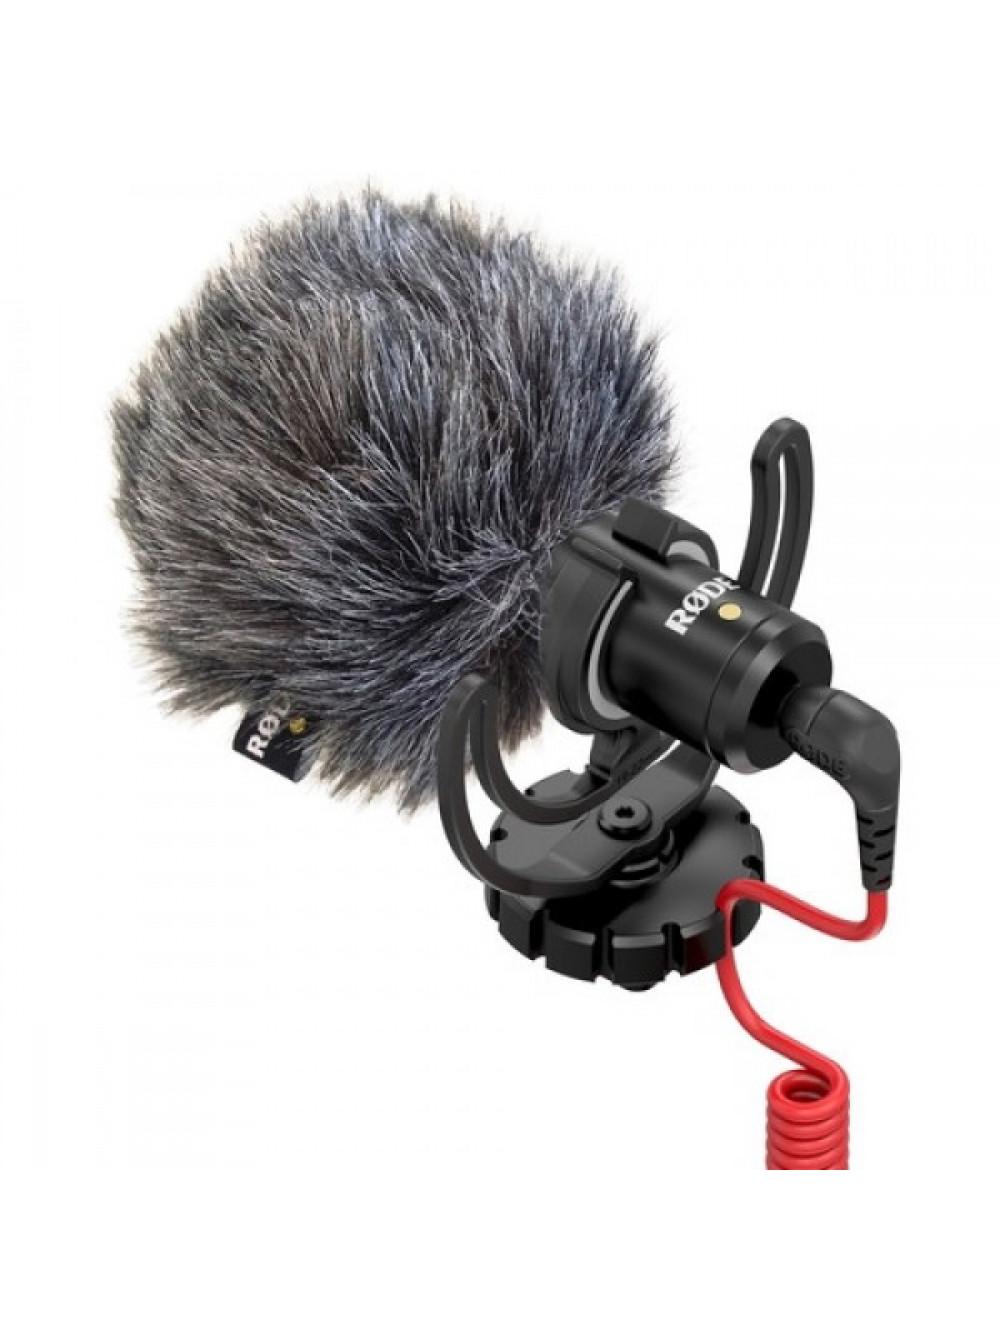 RODE VIDEOMICRO Микрофон